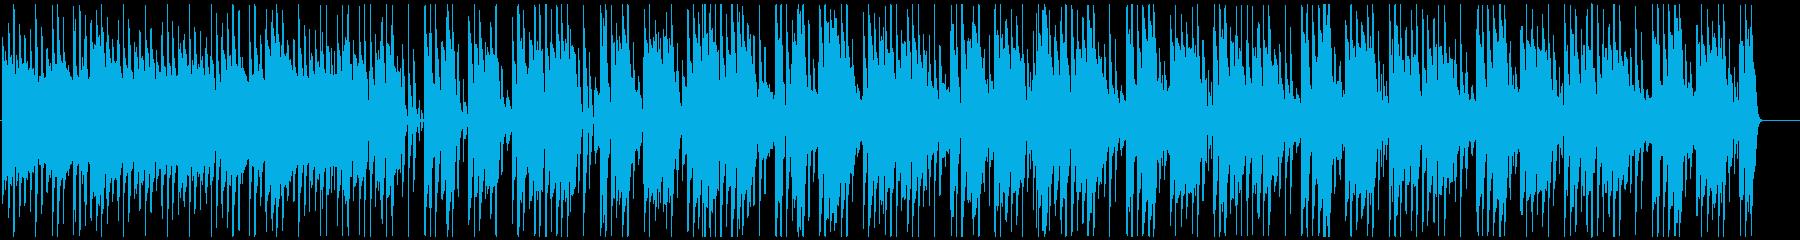 Reggae sadly sweet One Drop's reproduced waveform